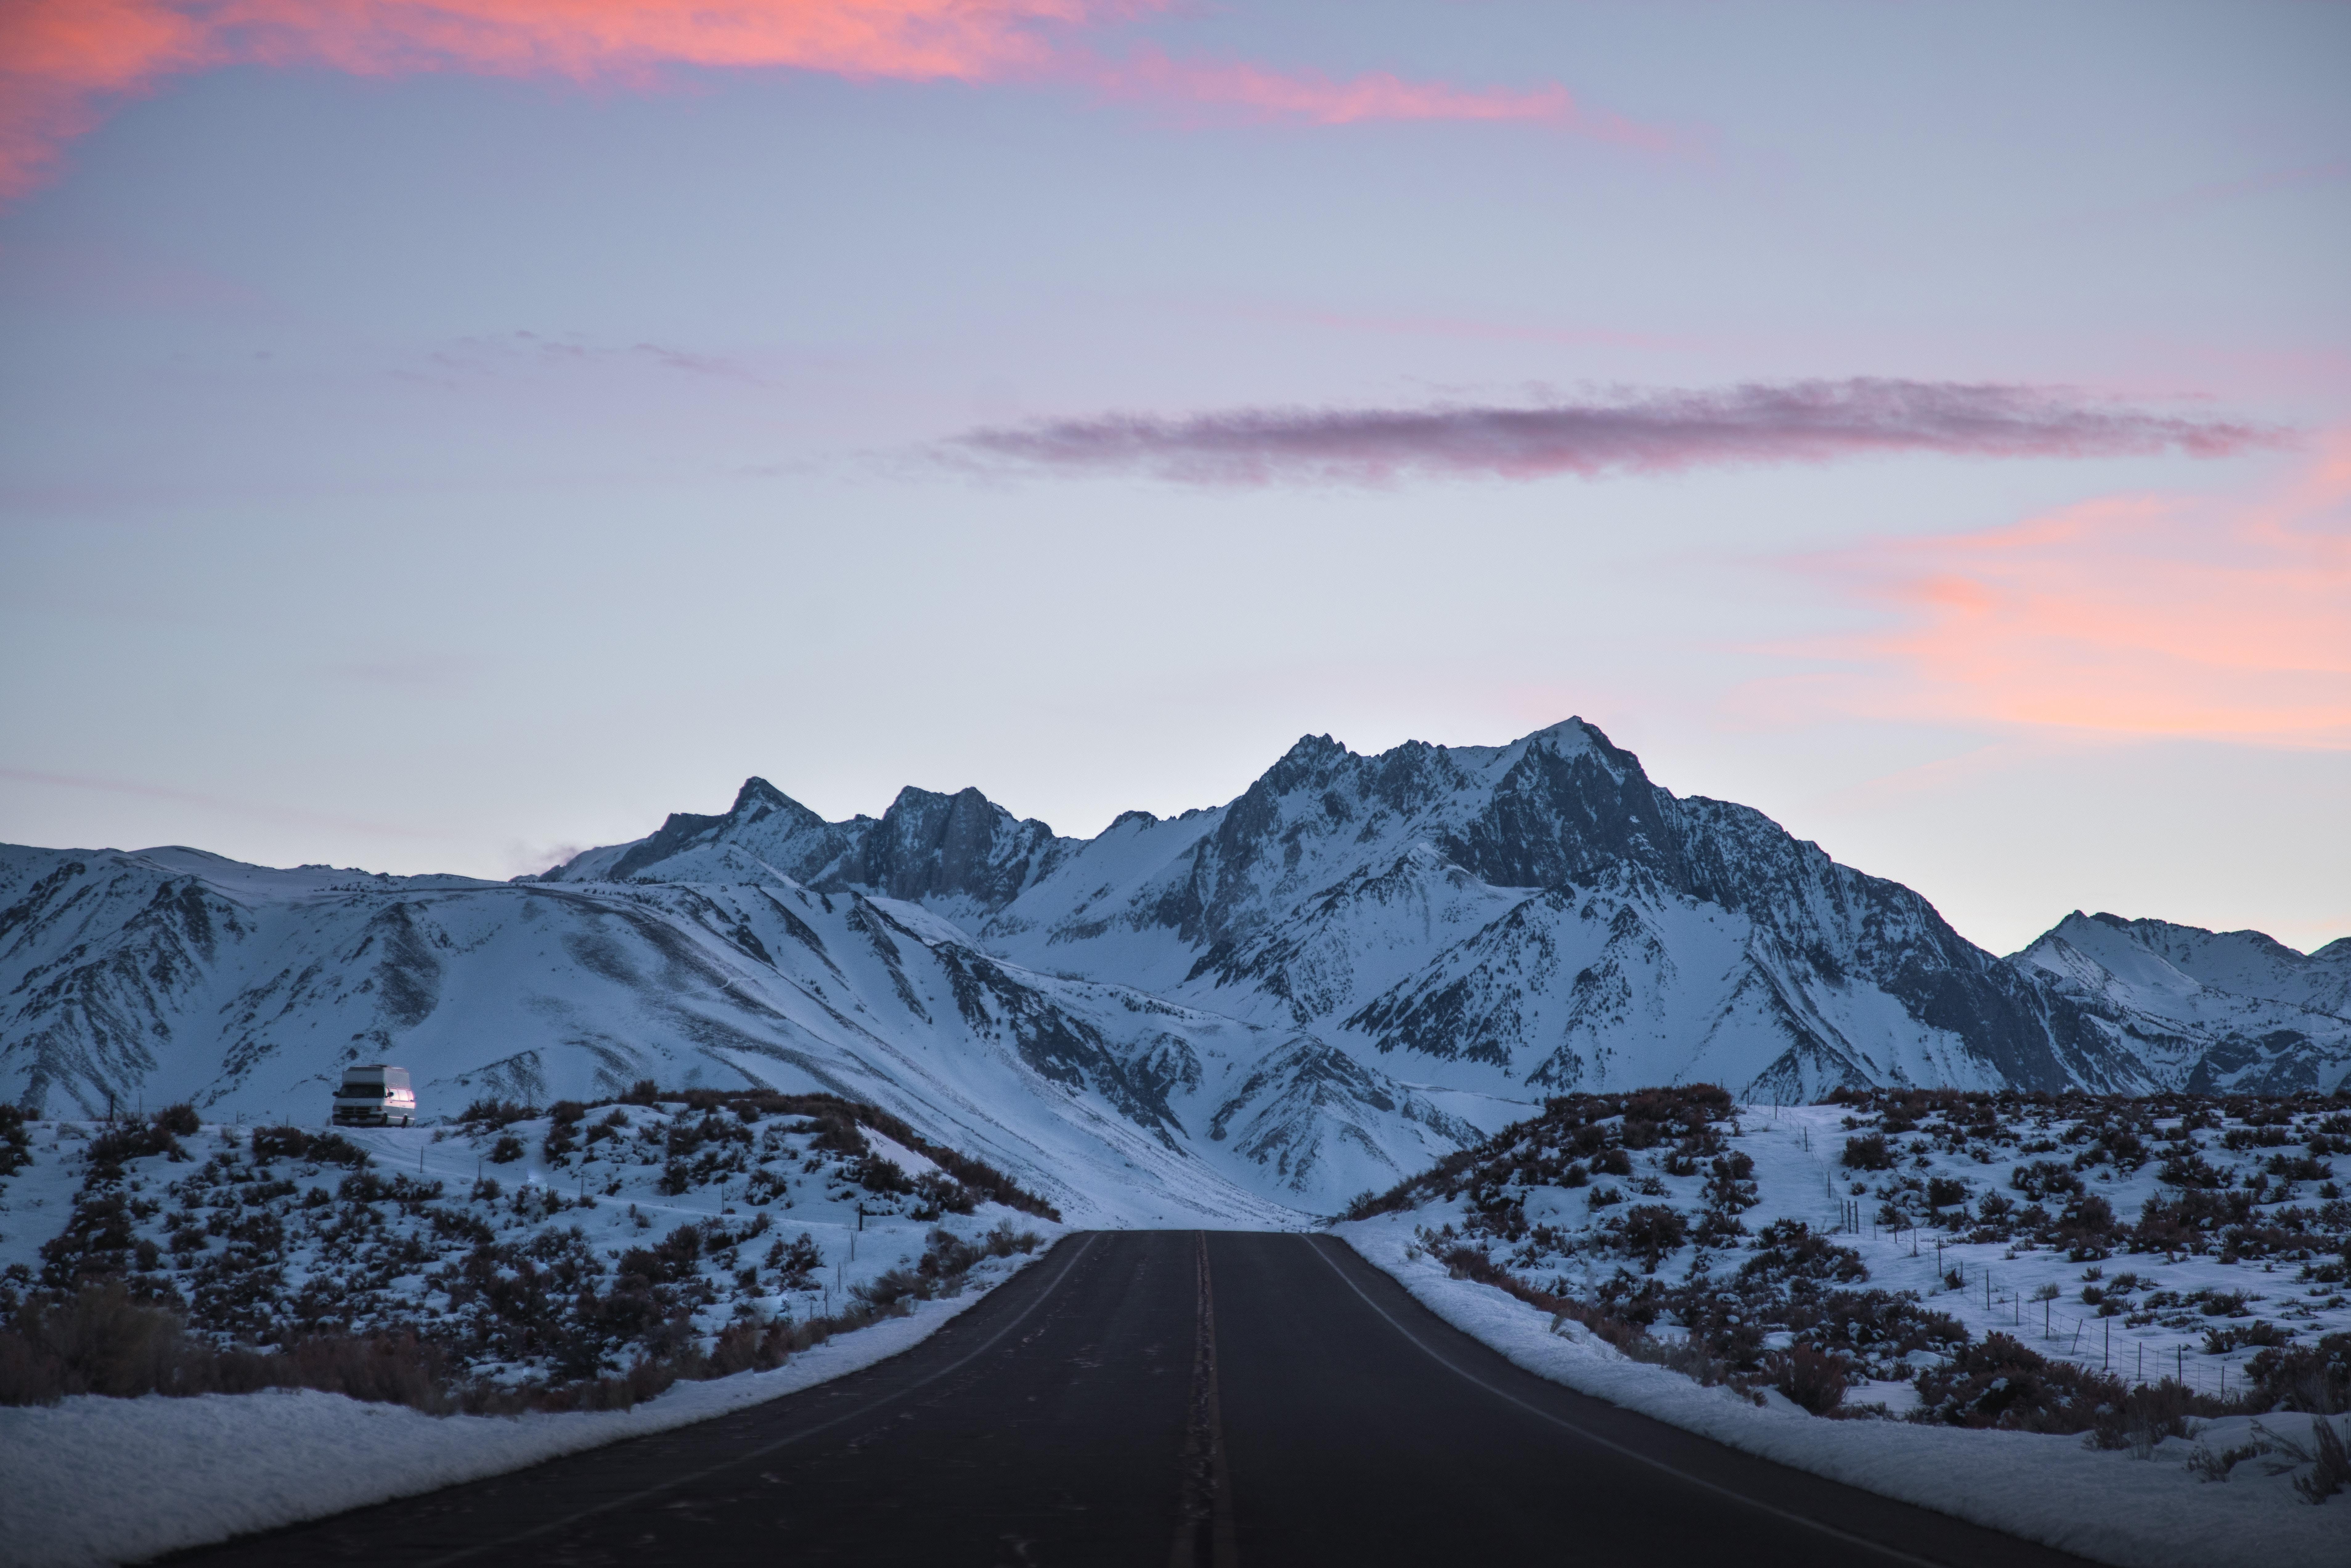 road outdoors snowy peak 1574939474 - Road Outdoors Snowy Peak -